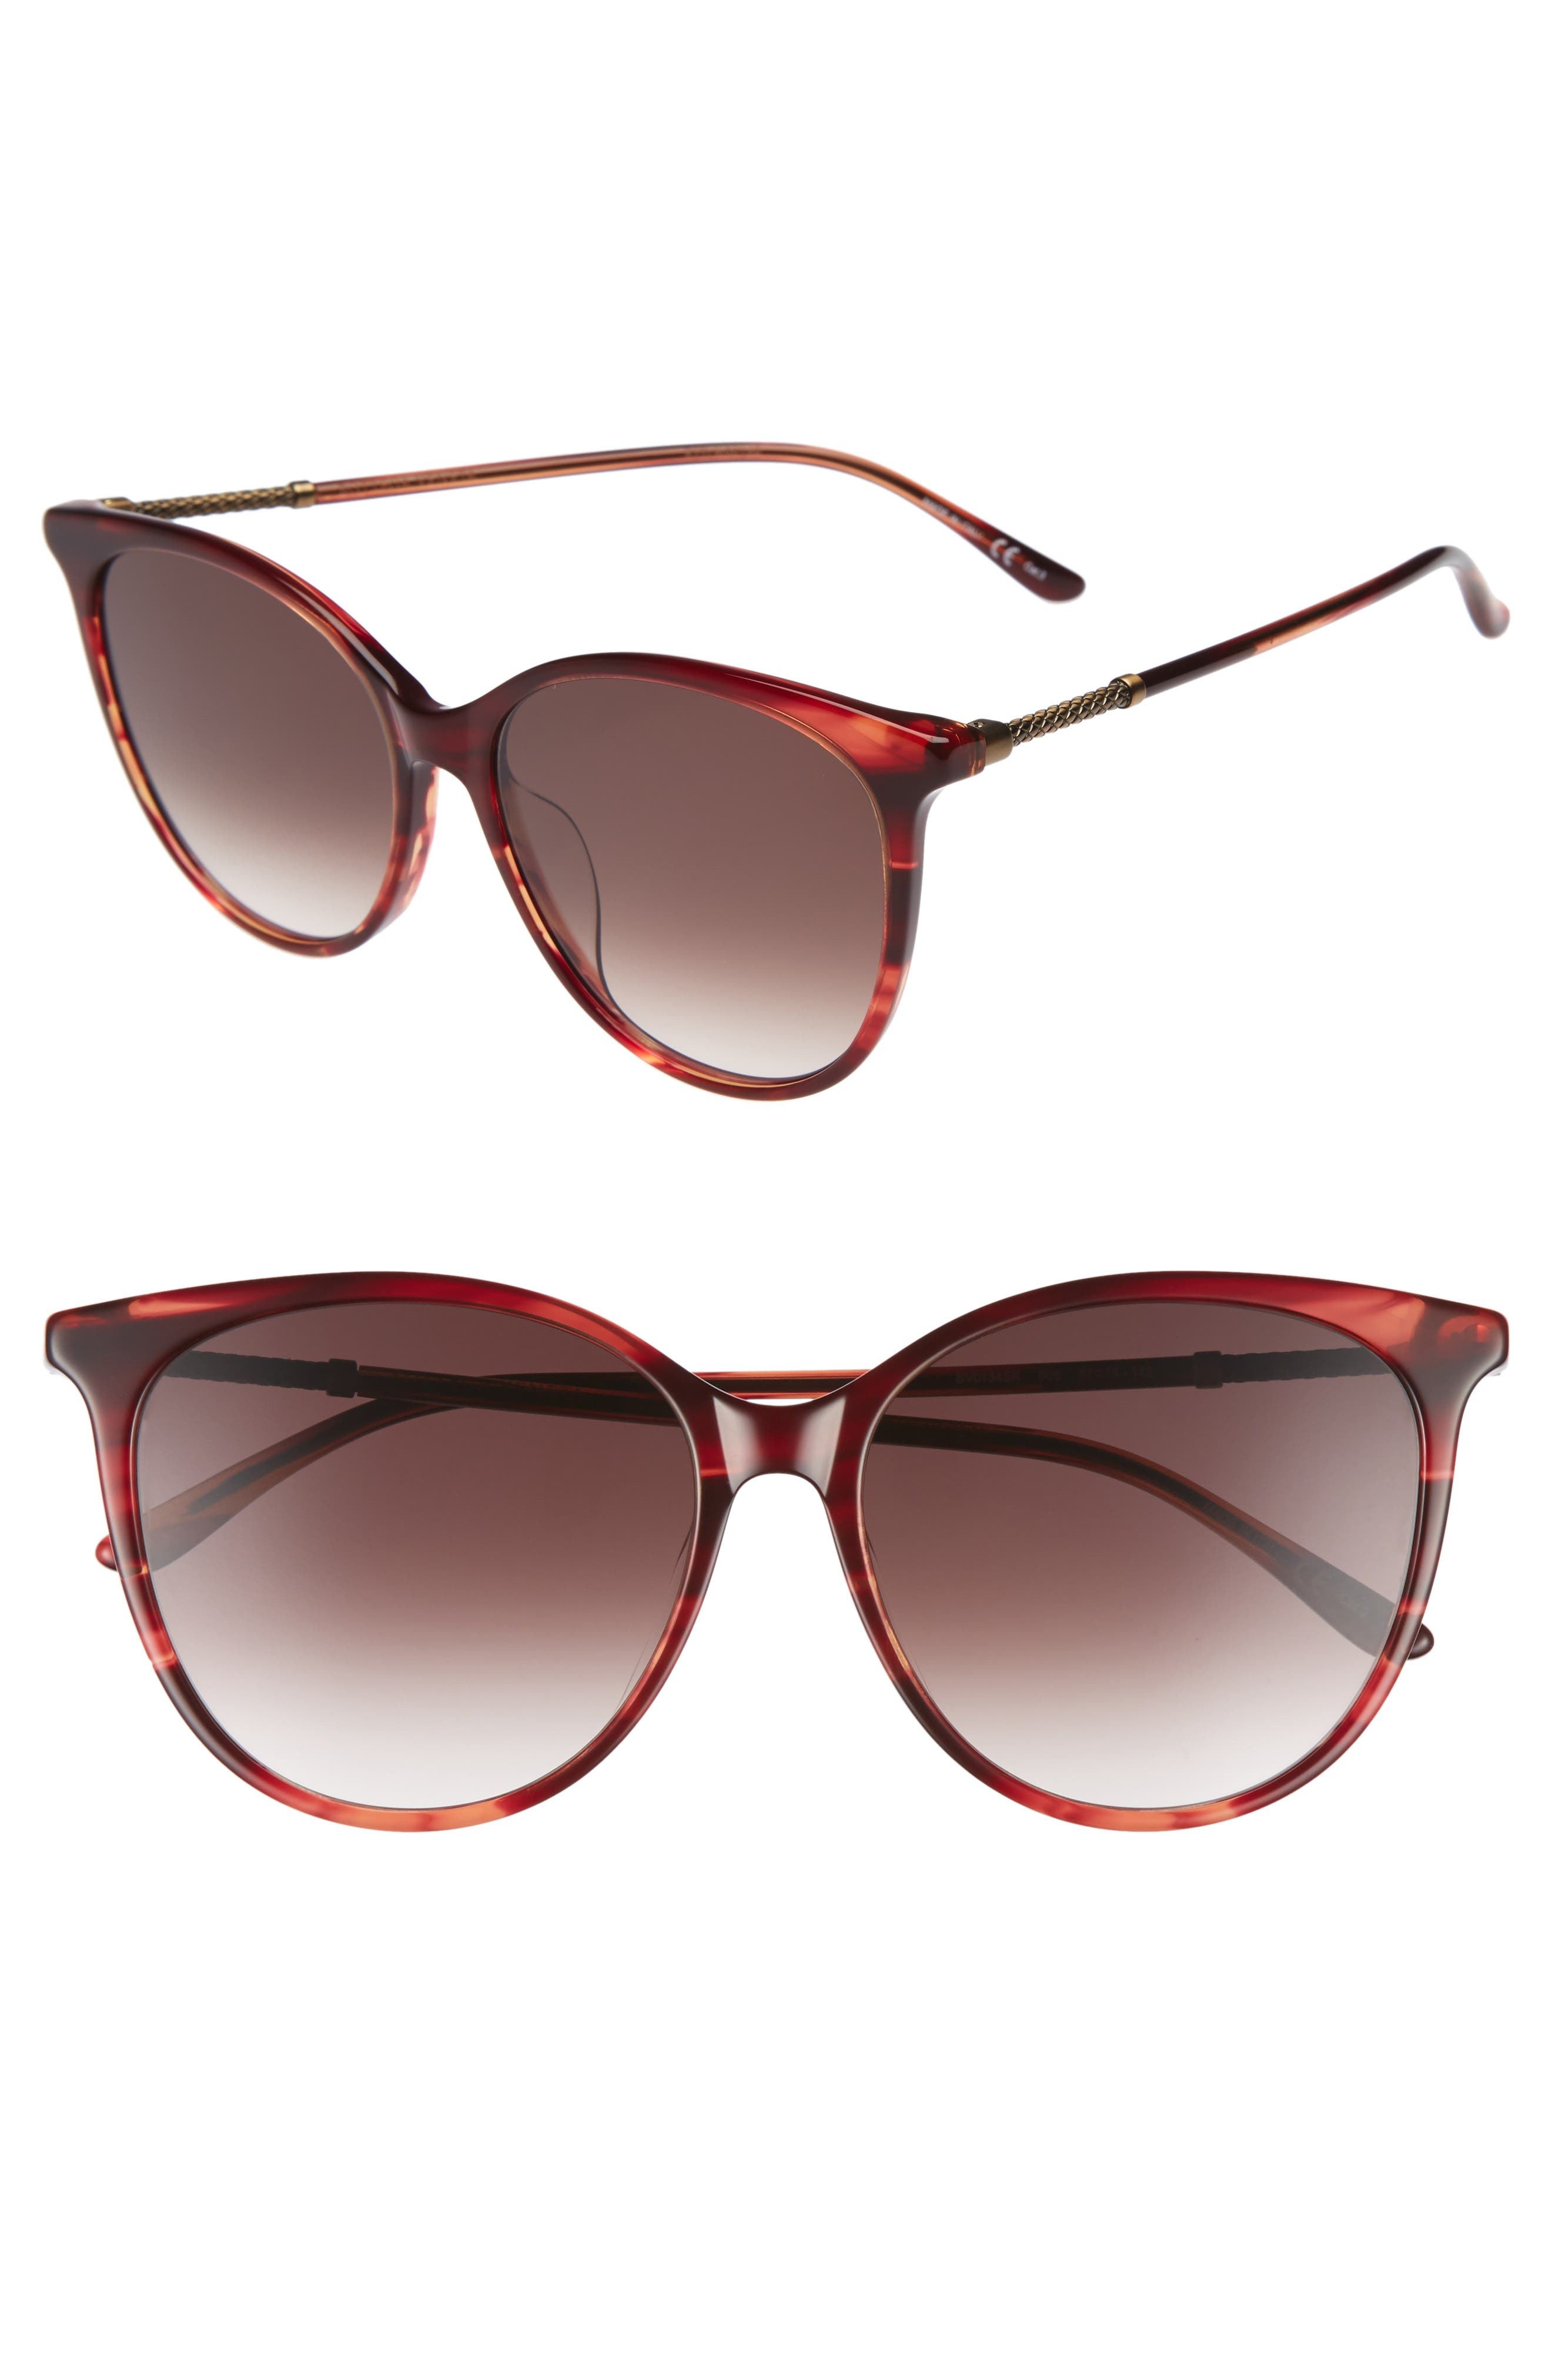 57mm Cat Eye Sunglasses,                             Main thumbnail 1, color,                             Red